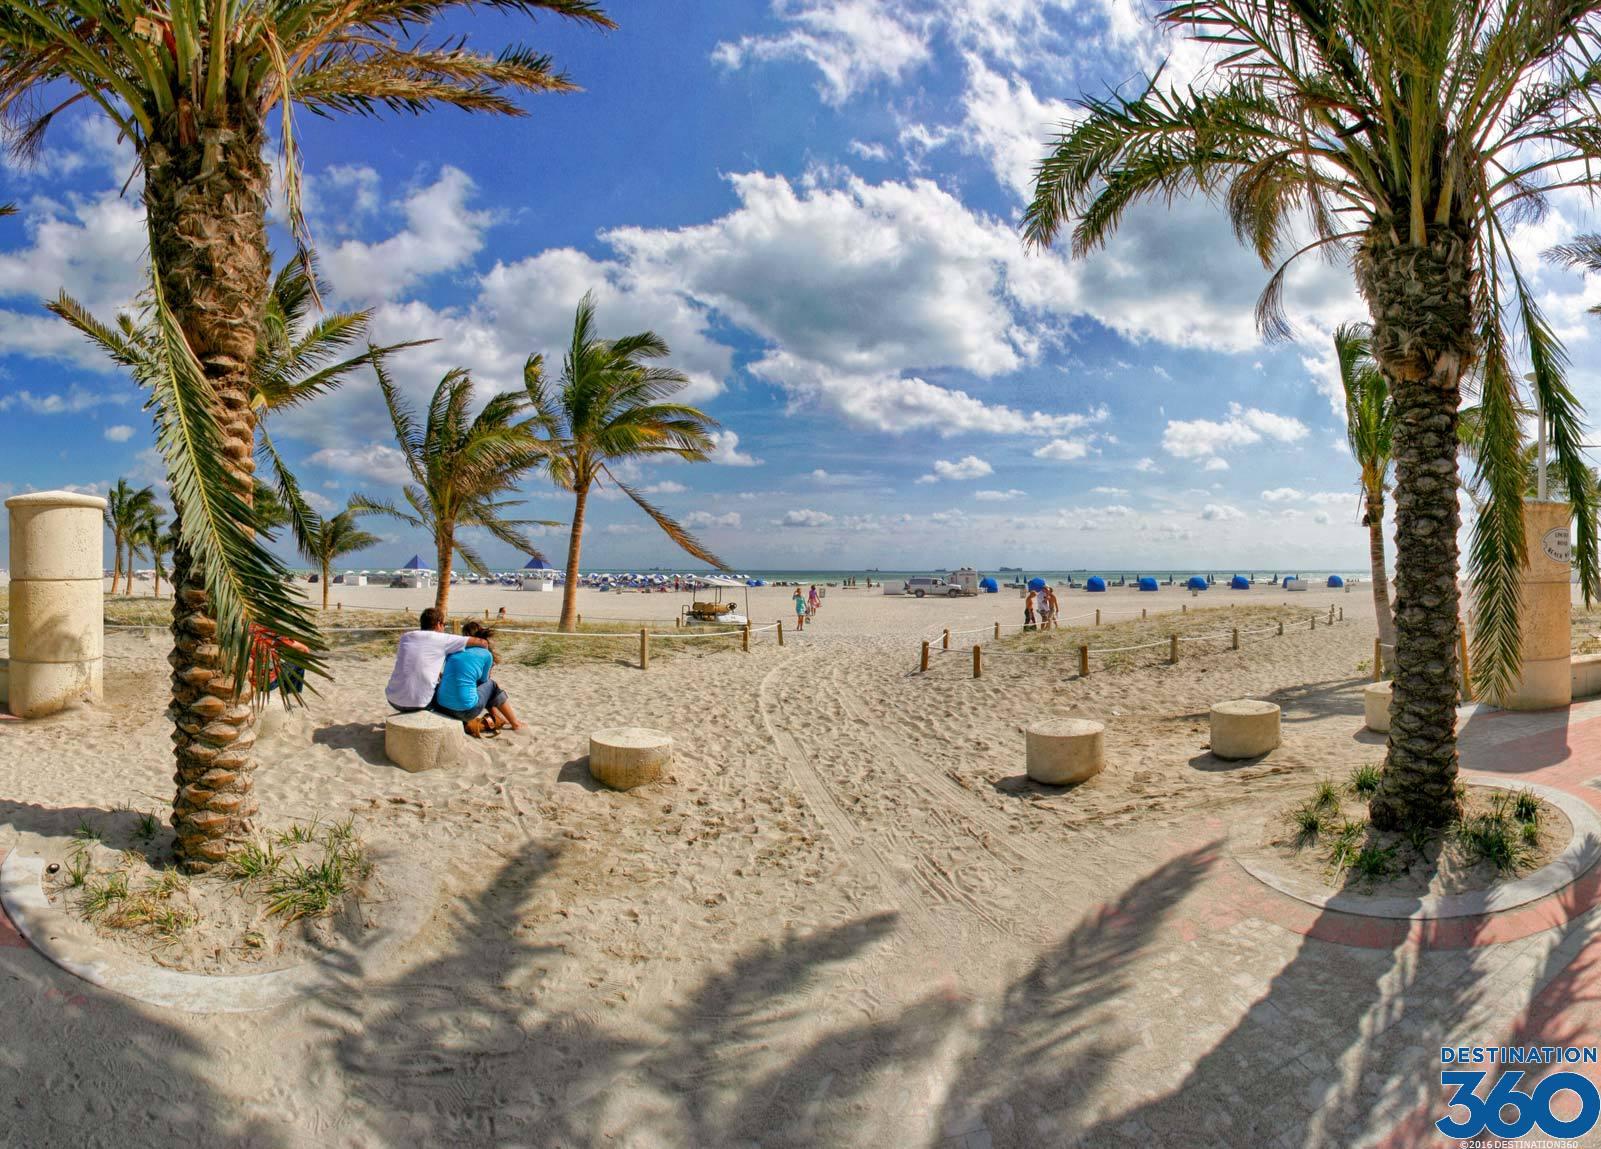 Hotels In Haulover Beach Florida